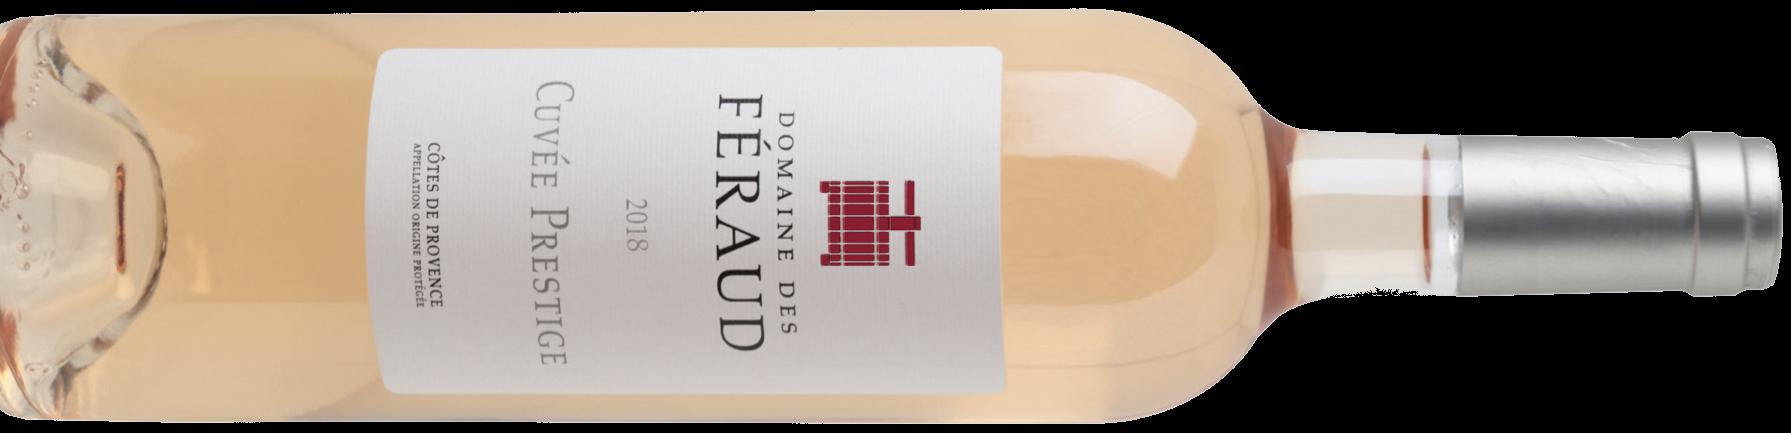 Feraud Cuvee Prestige Rose 2018 home